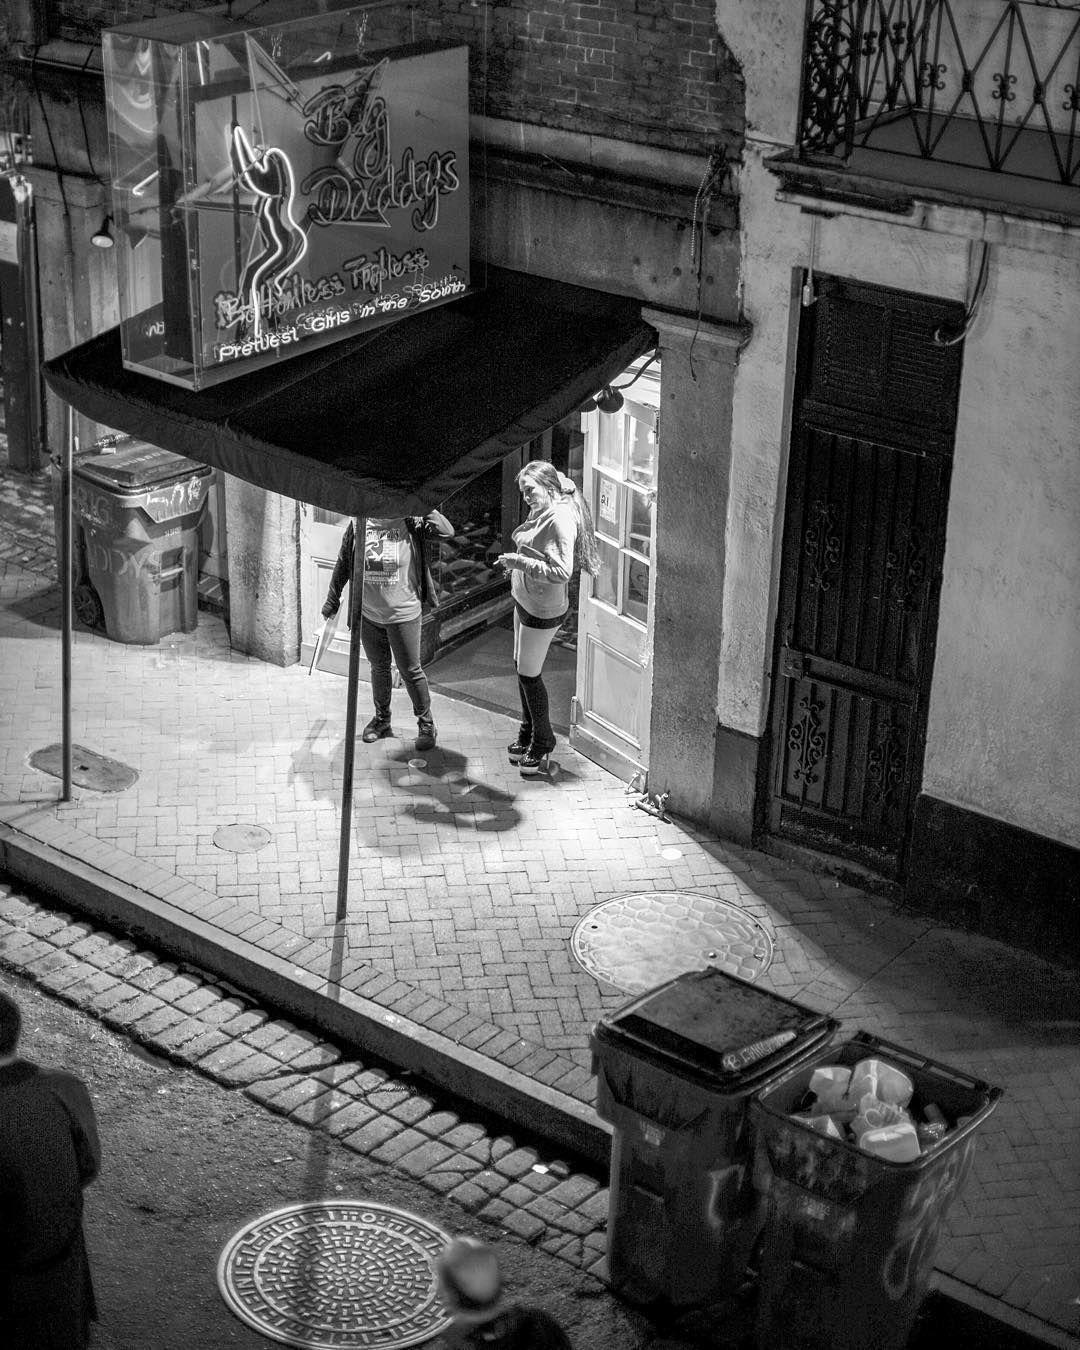 #NOLA #neworleans #frenchquarter #bourbonsteeet #poledancing #leica #leicamp #noctilux #noctilumens by monty29121967